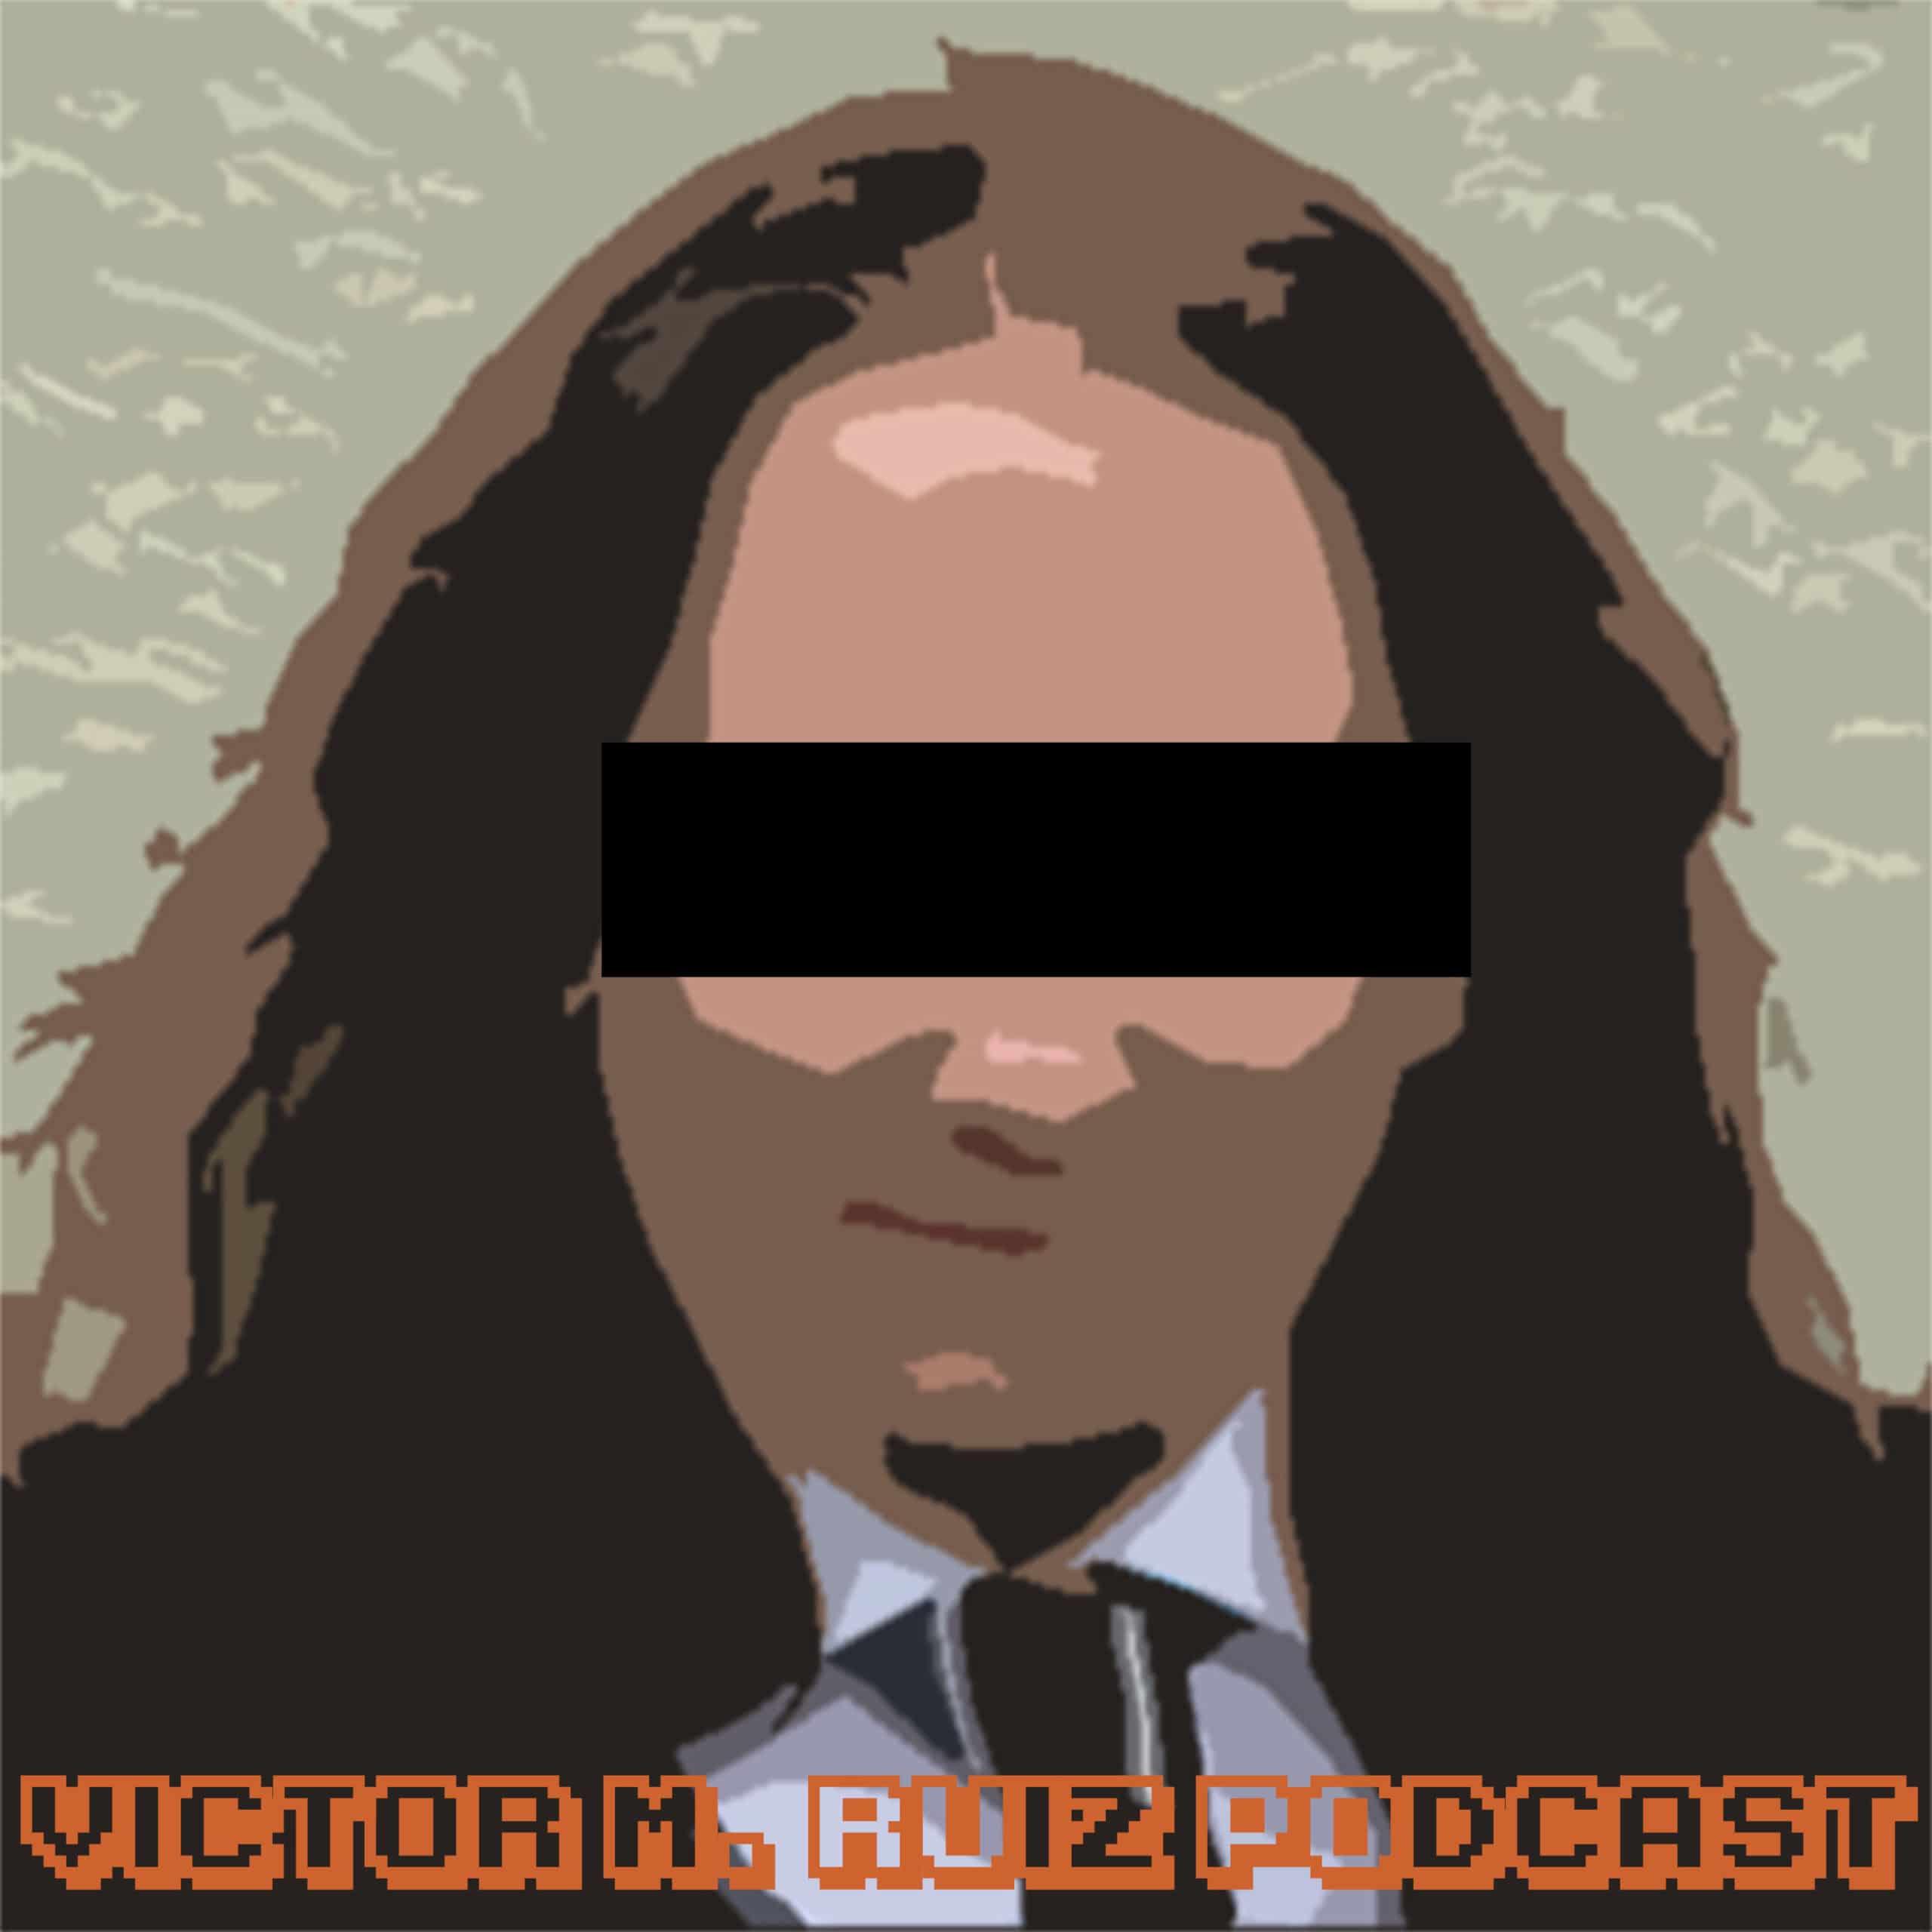 Victor M. Ruiz Podcast